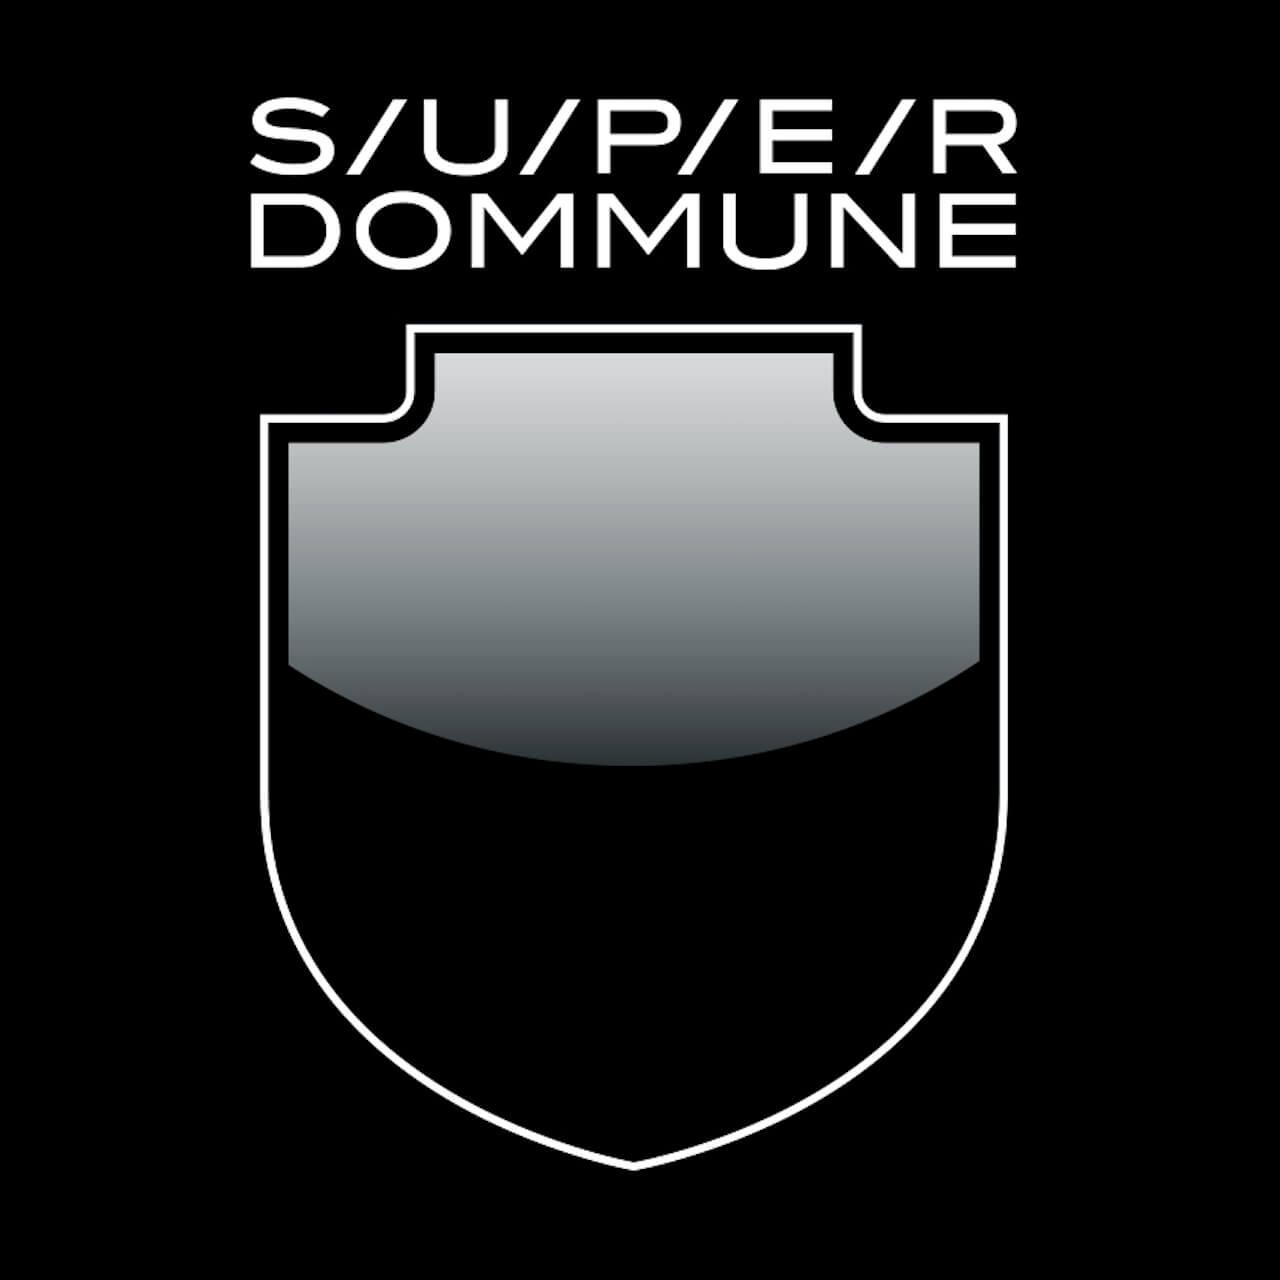 DOMMUNEが渋谷PARCO9階のクリエイティヴスタジオに移転、SUPER DOMMUNEとして進化|本日からプレオープニングセレモニーが開催 music191122-superdommune-3